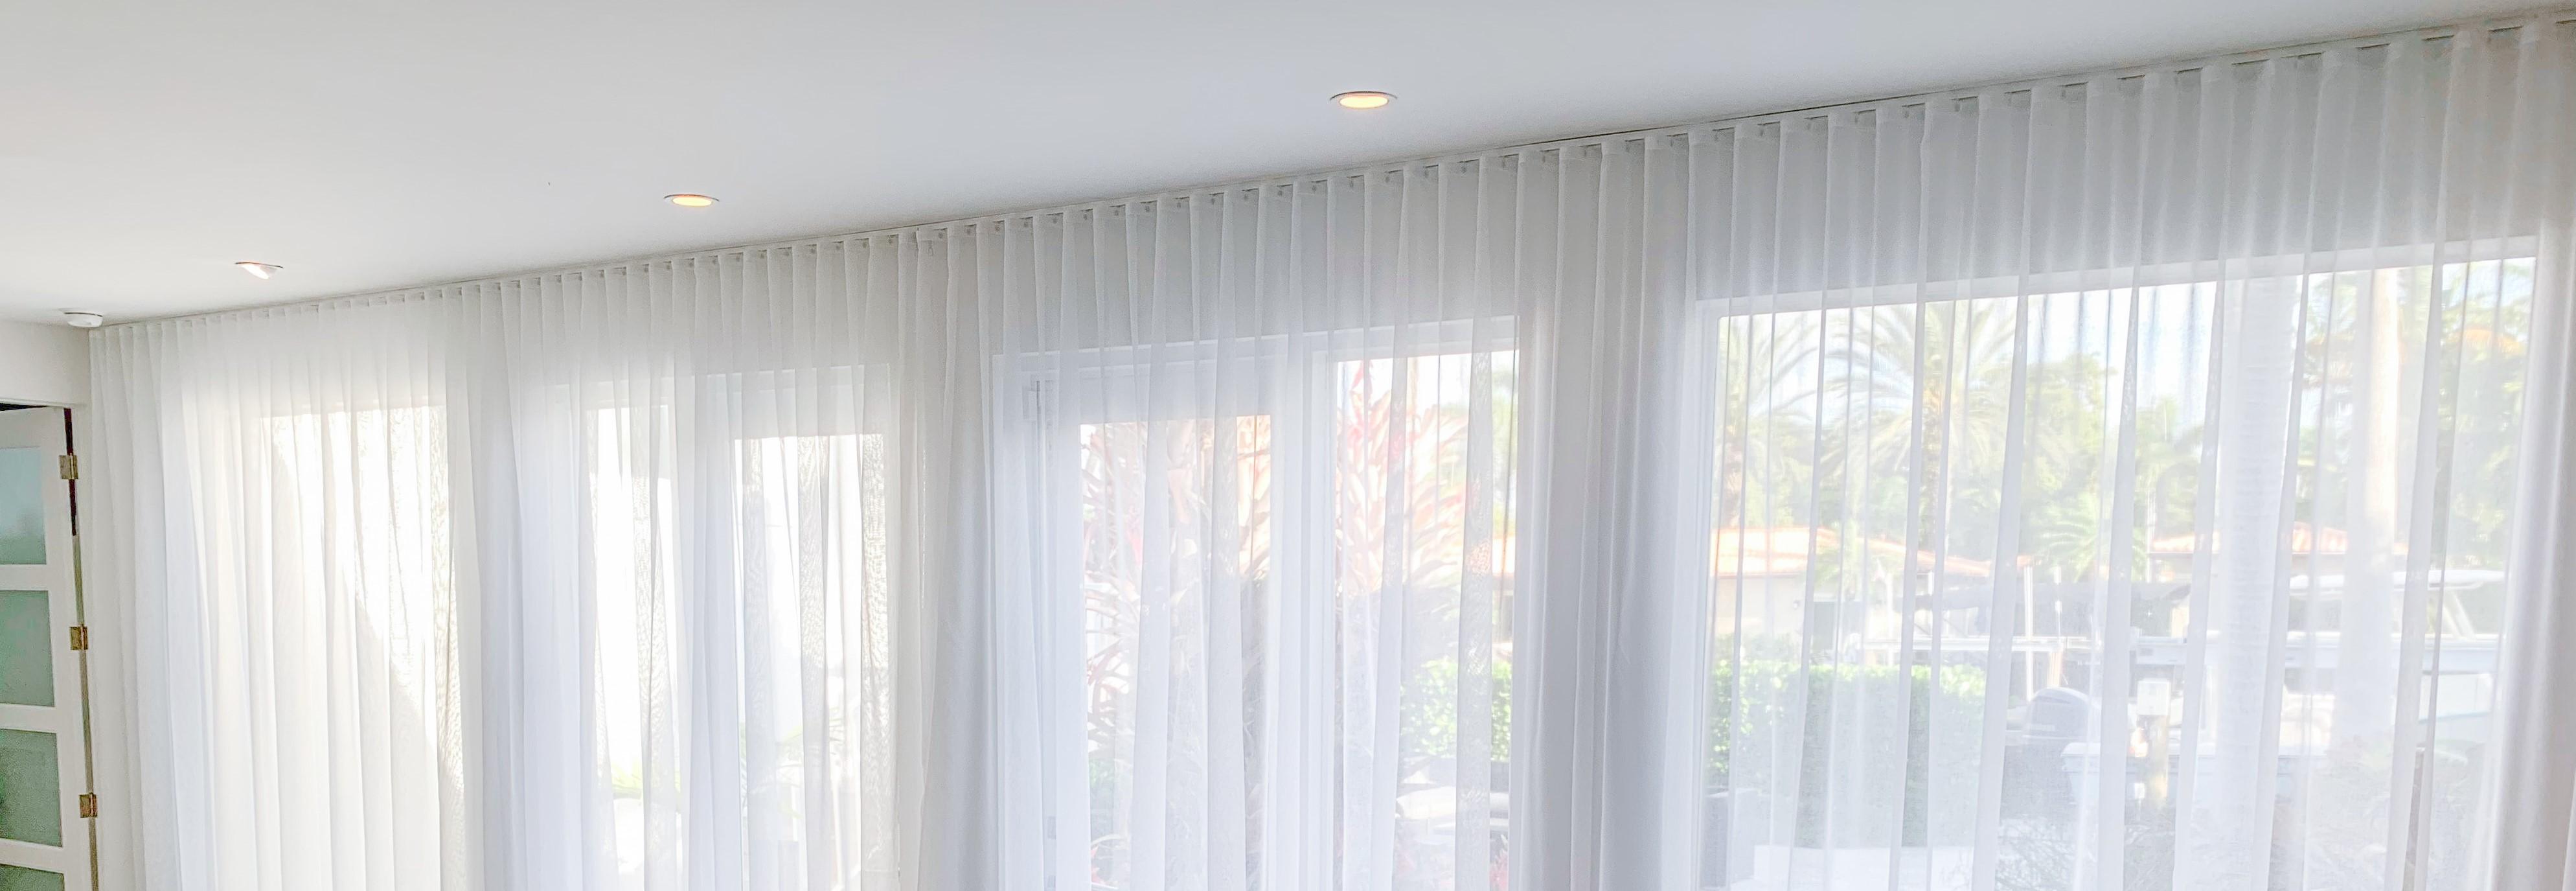 Custom Drapes Curtains Miami Ford Window Treatments